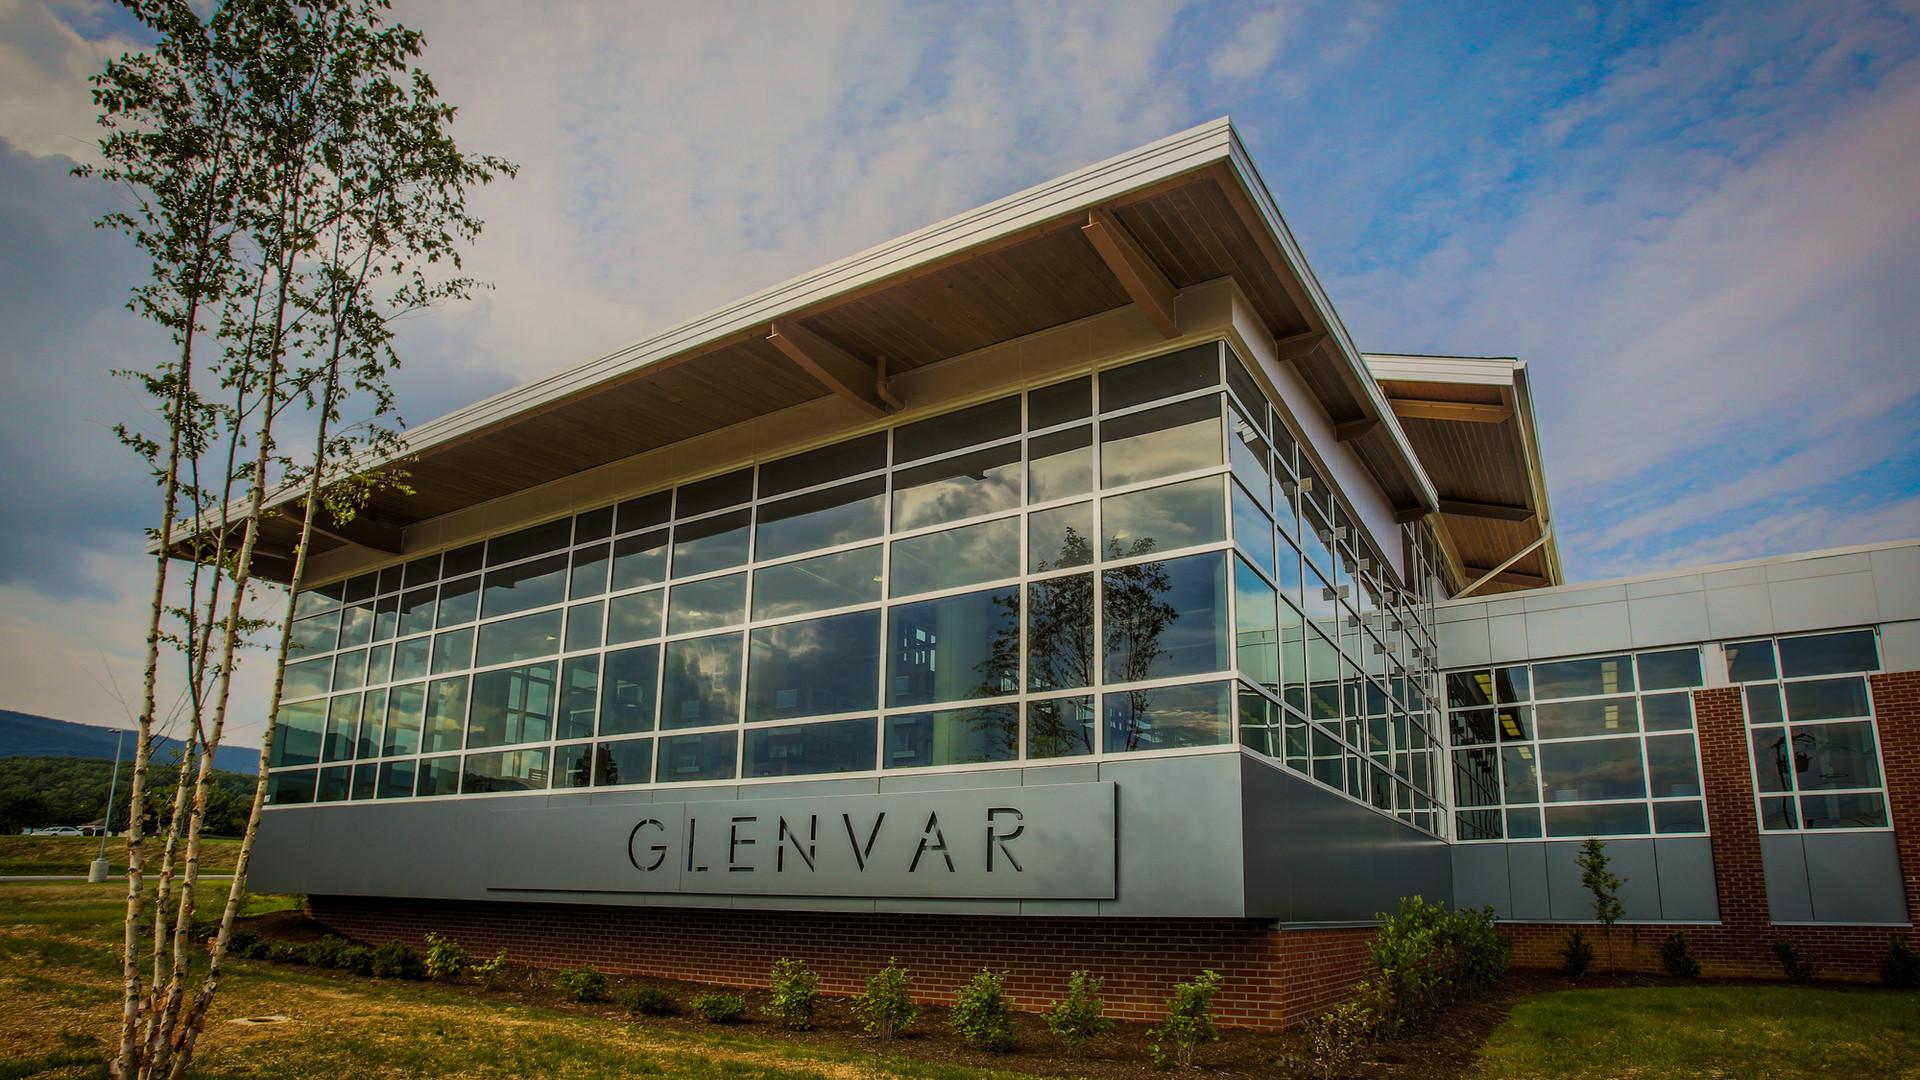 Glenvar Branch Library Roanoke County Public Library